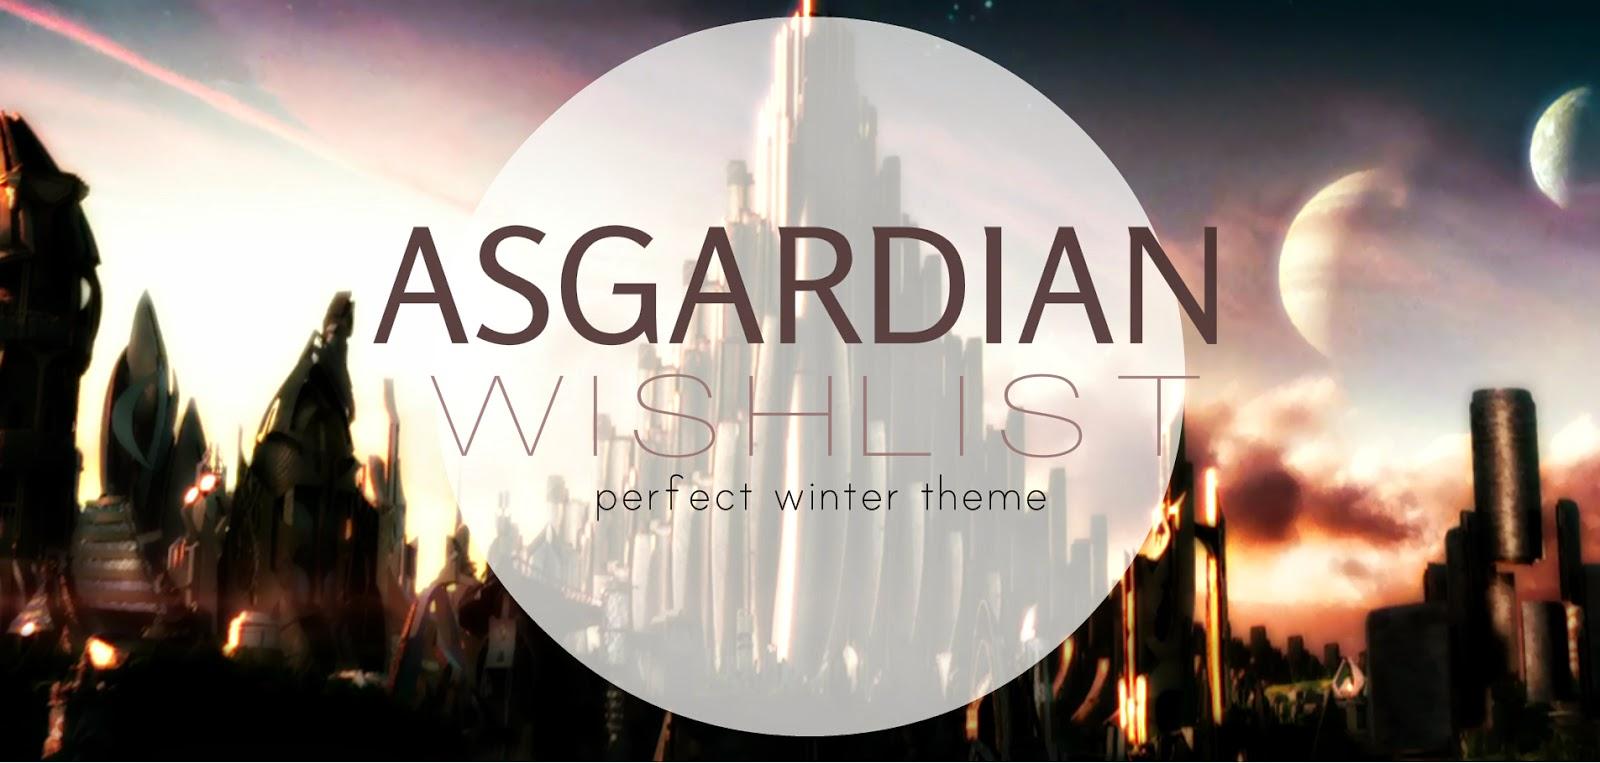 http://kerryshabitat.blogspot.co.uk/2013/12/a-perfect-unique-winter-asgardian.html